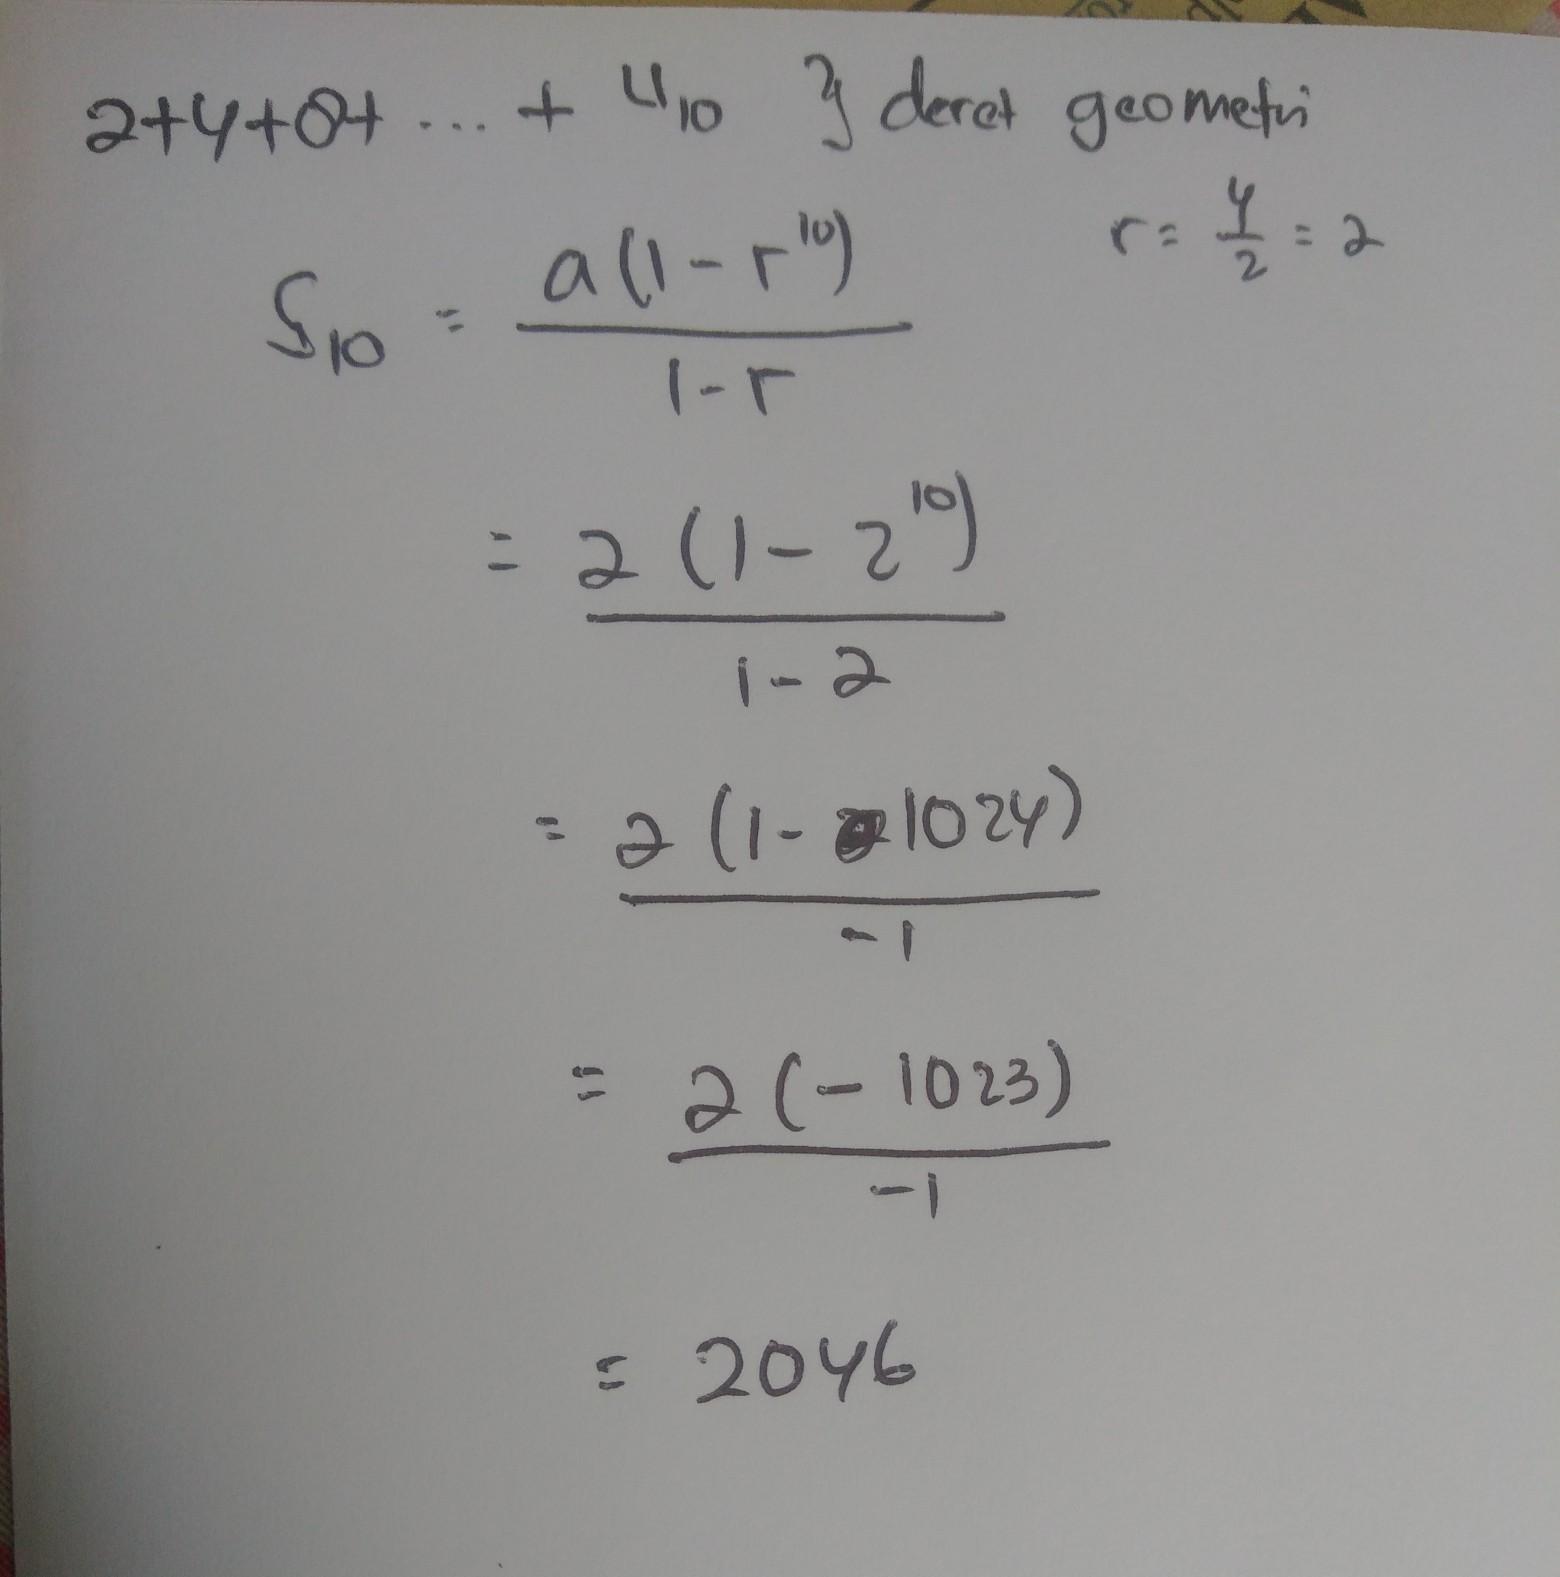 Hitunglah jumlah deret geometri 2+4+8+... sampai 10 suku ...